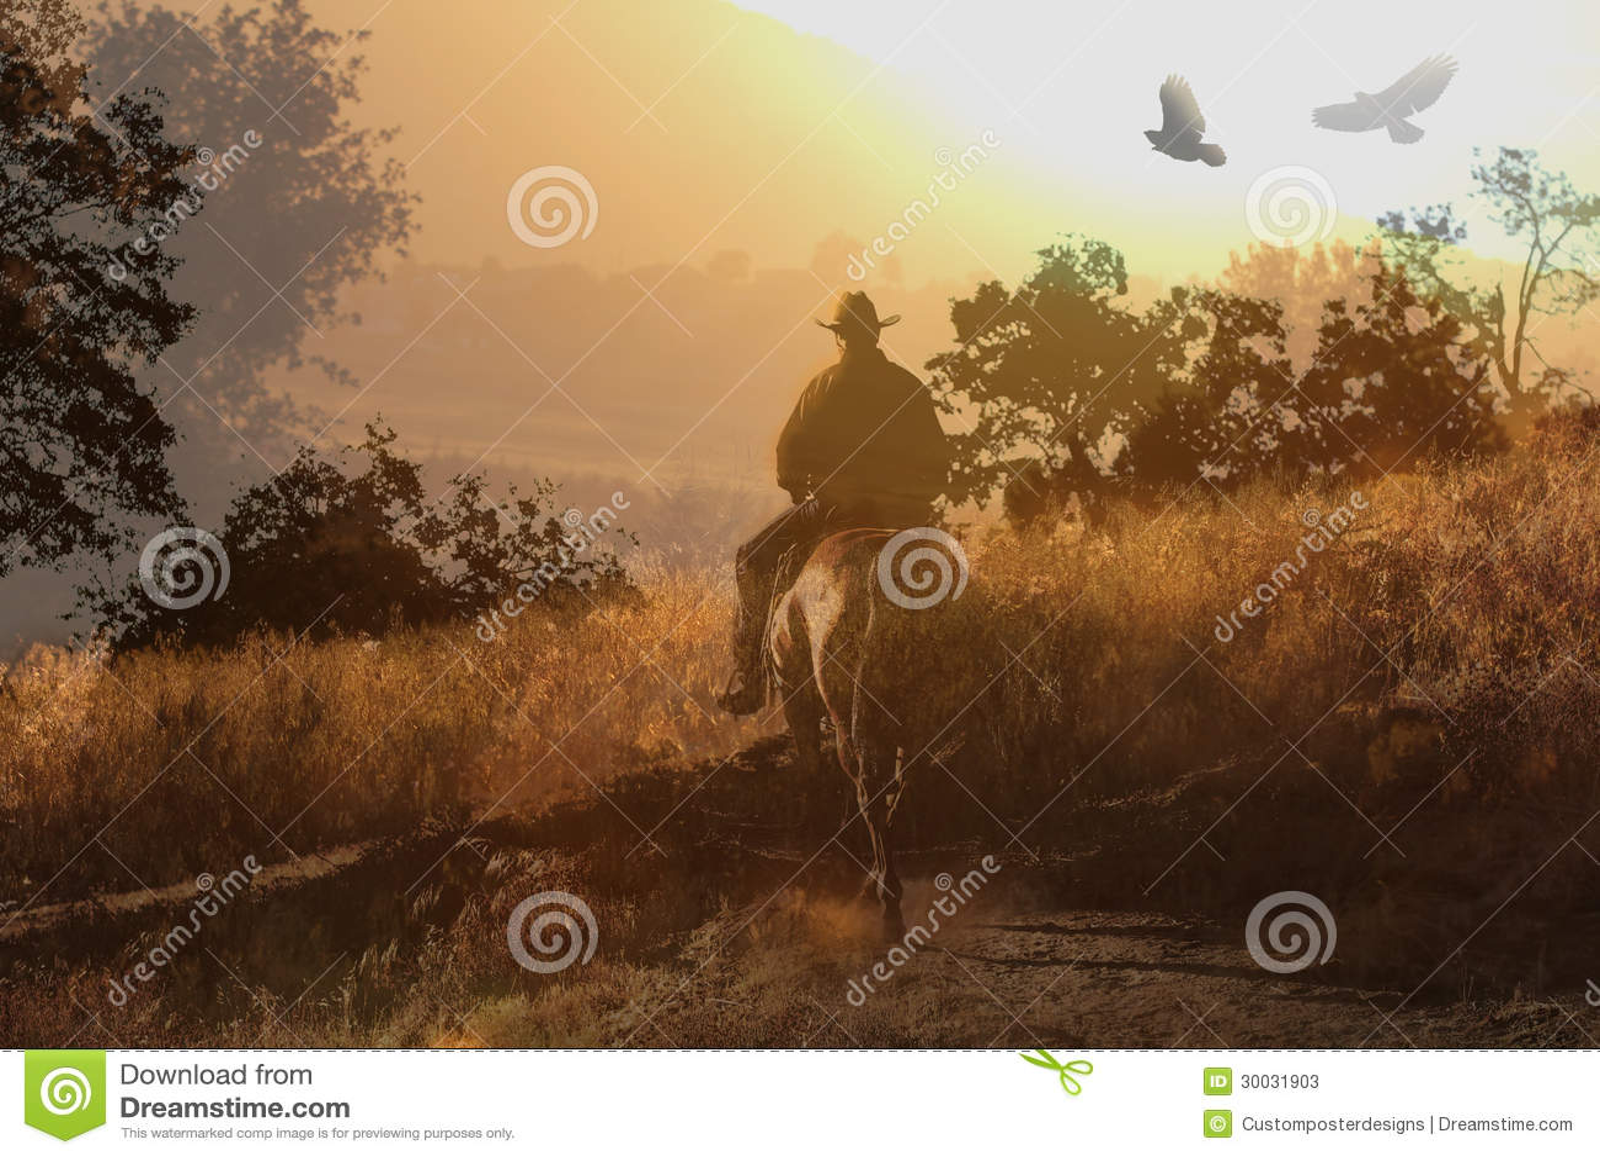 A cowboy riding a horse V.